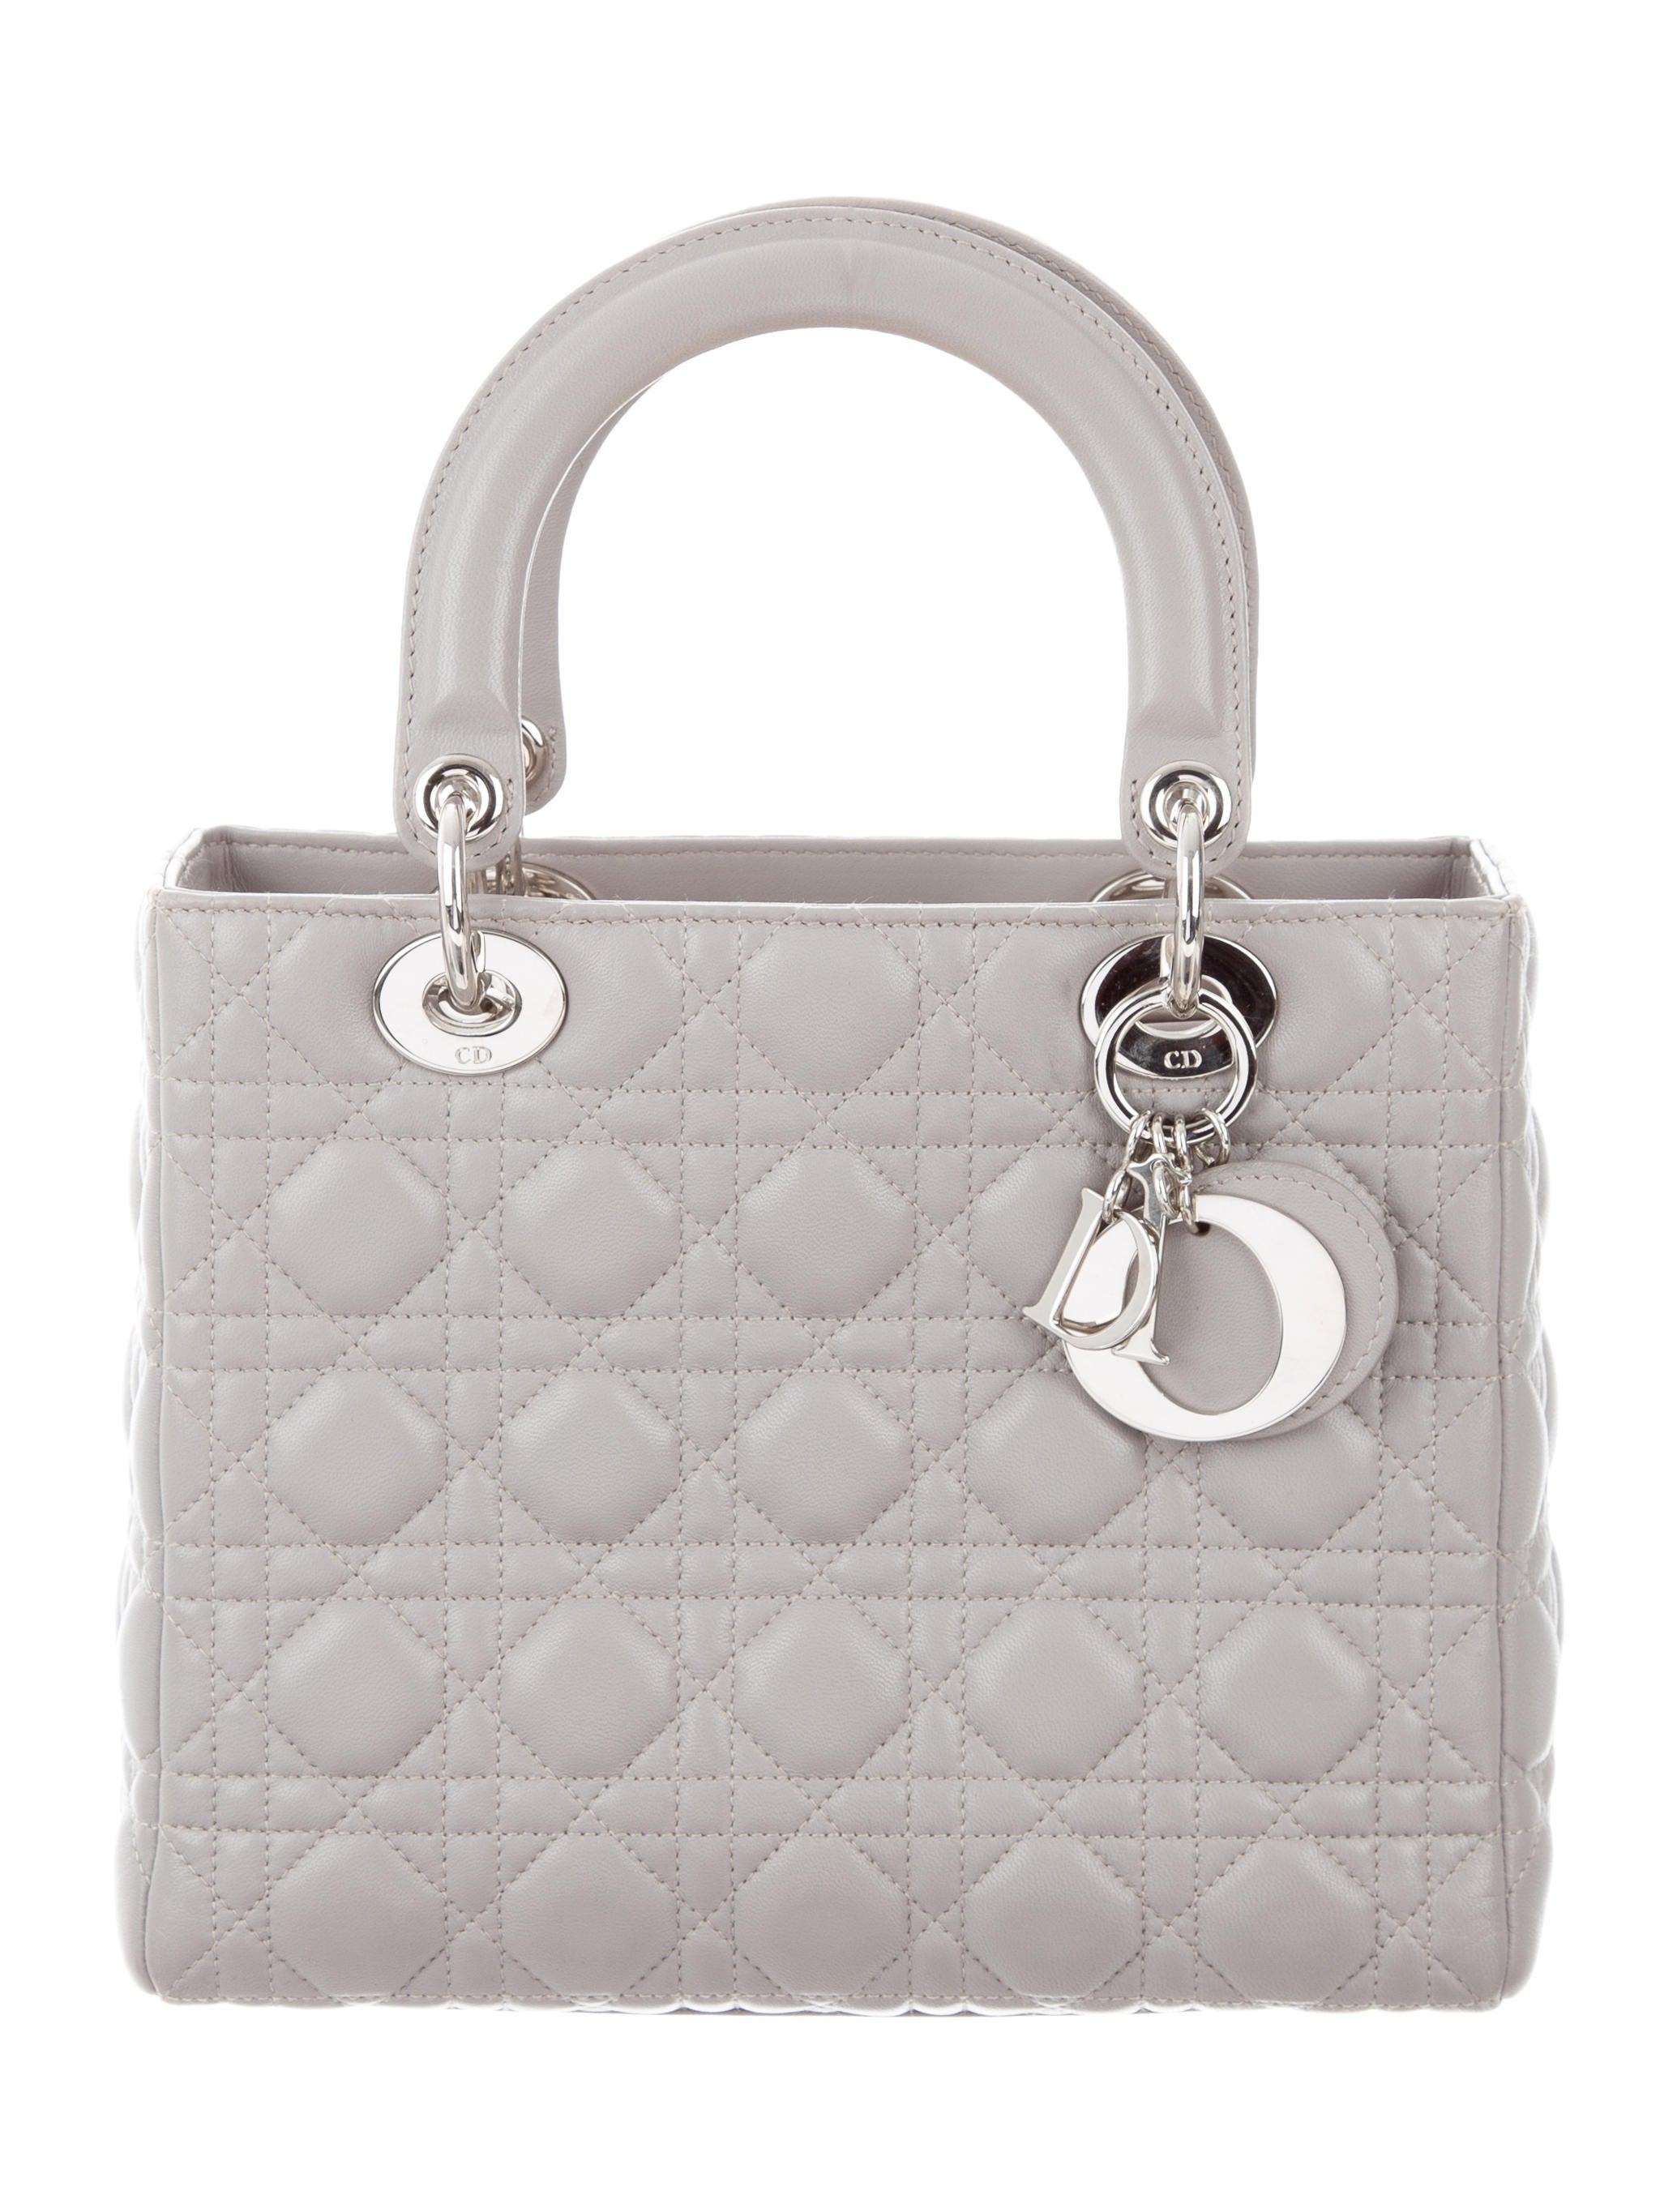 christian dior medium lady dior bag handbags chr58524 the realreal. Black Bedroom Furniture Sets. Home Design Ideas